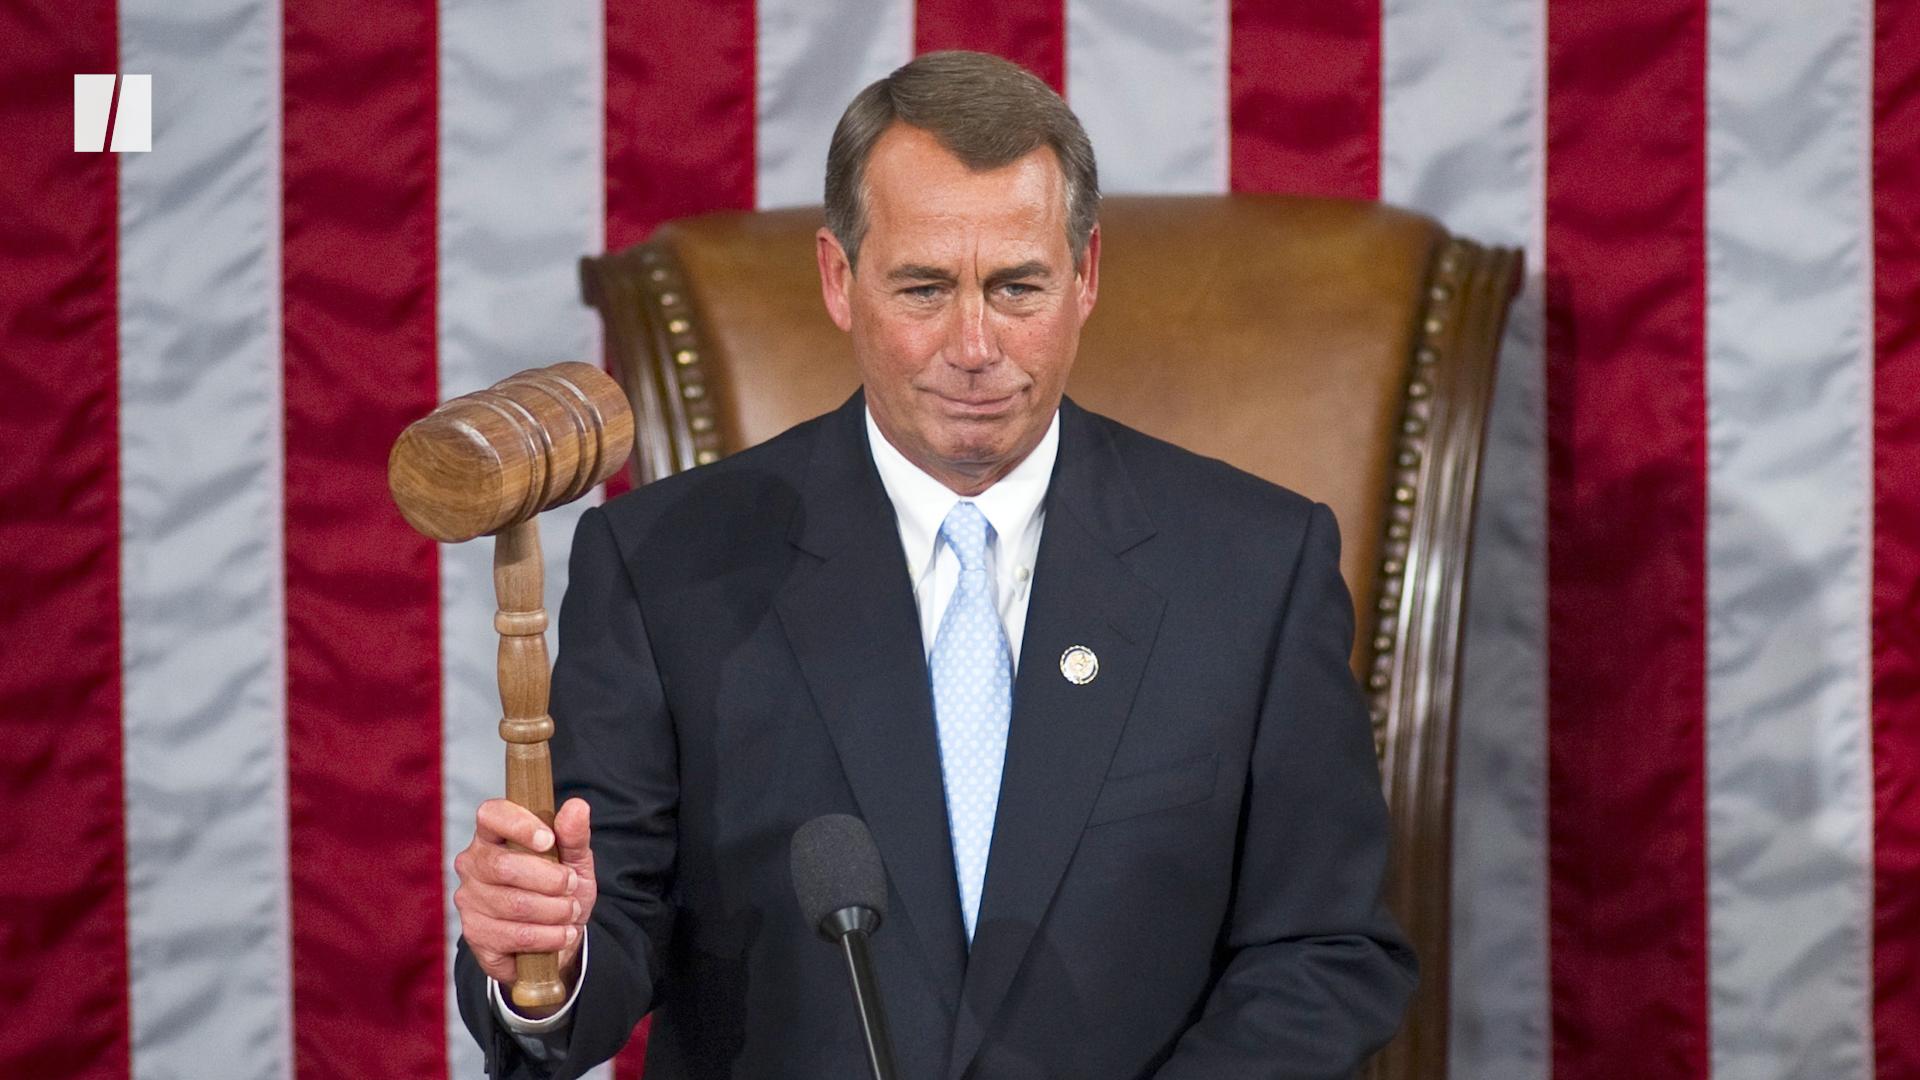 John Boehner Blasts Donald Trump